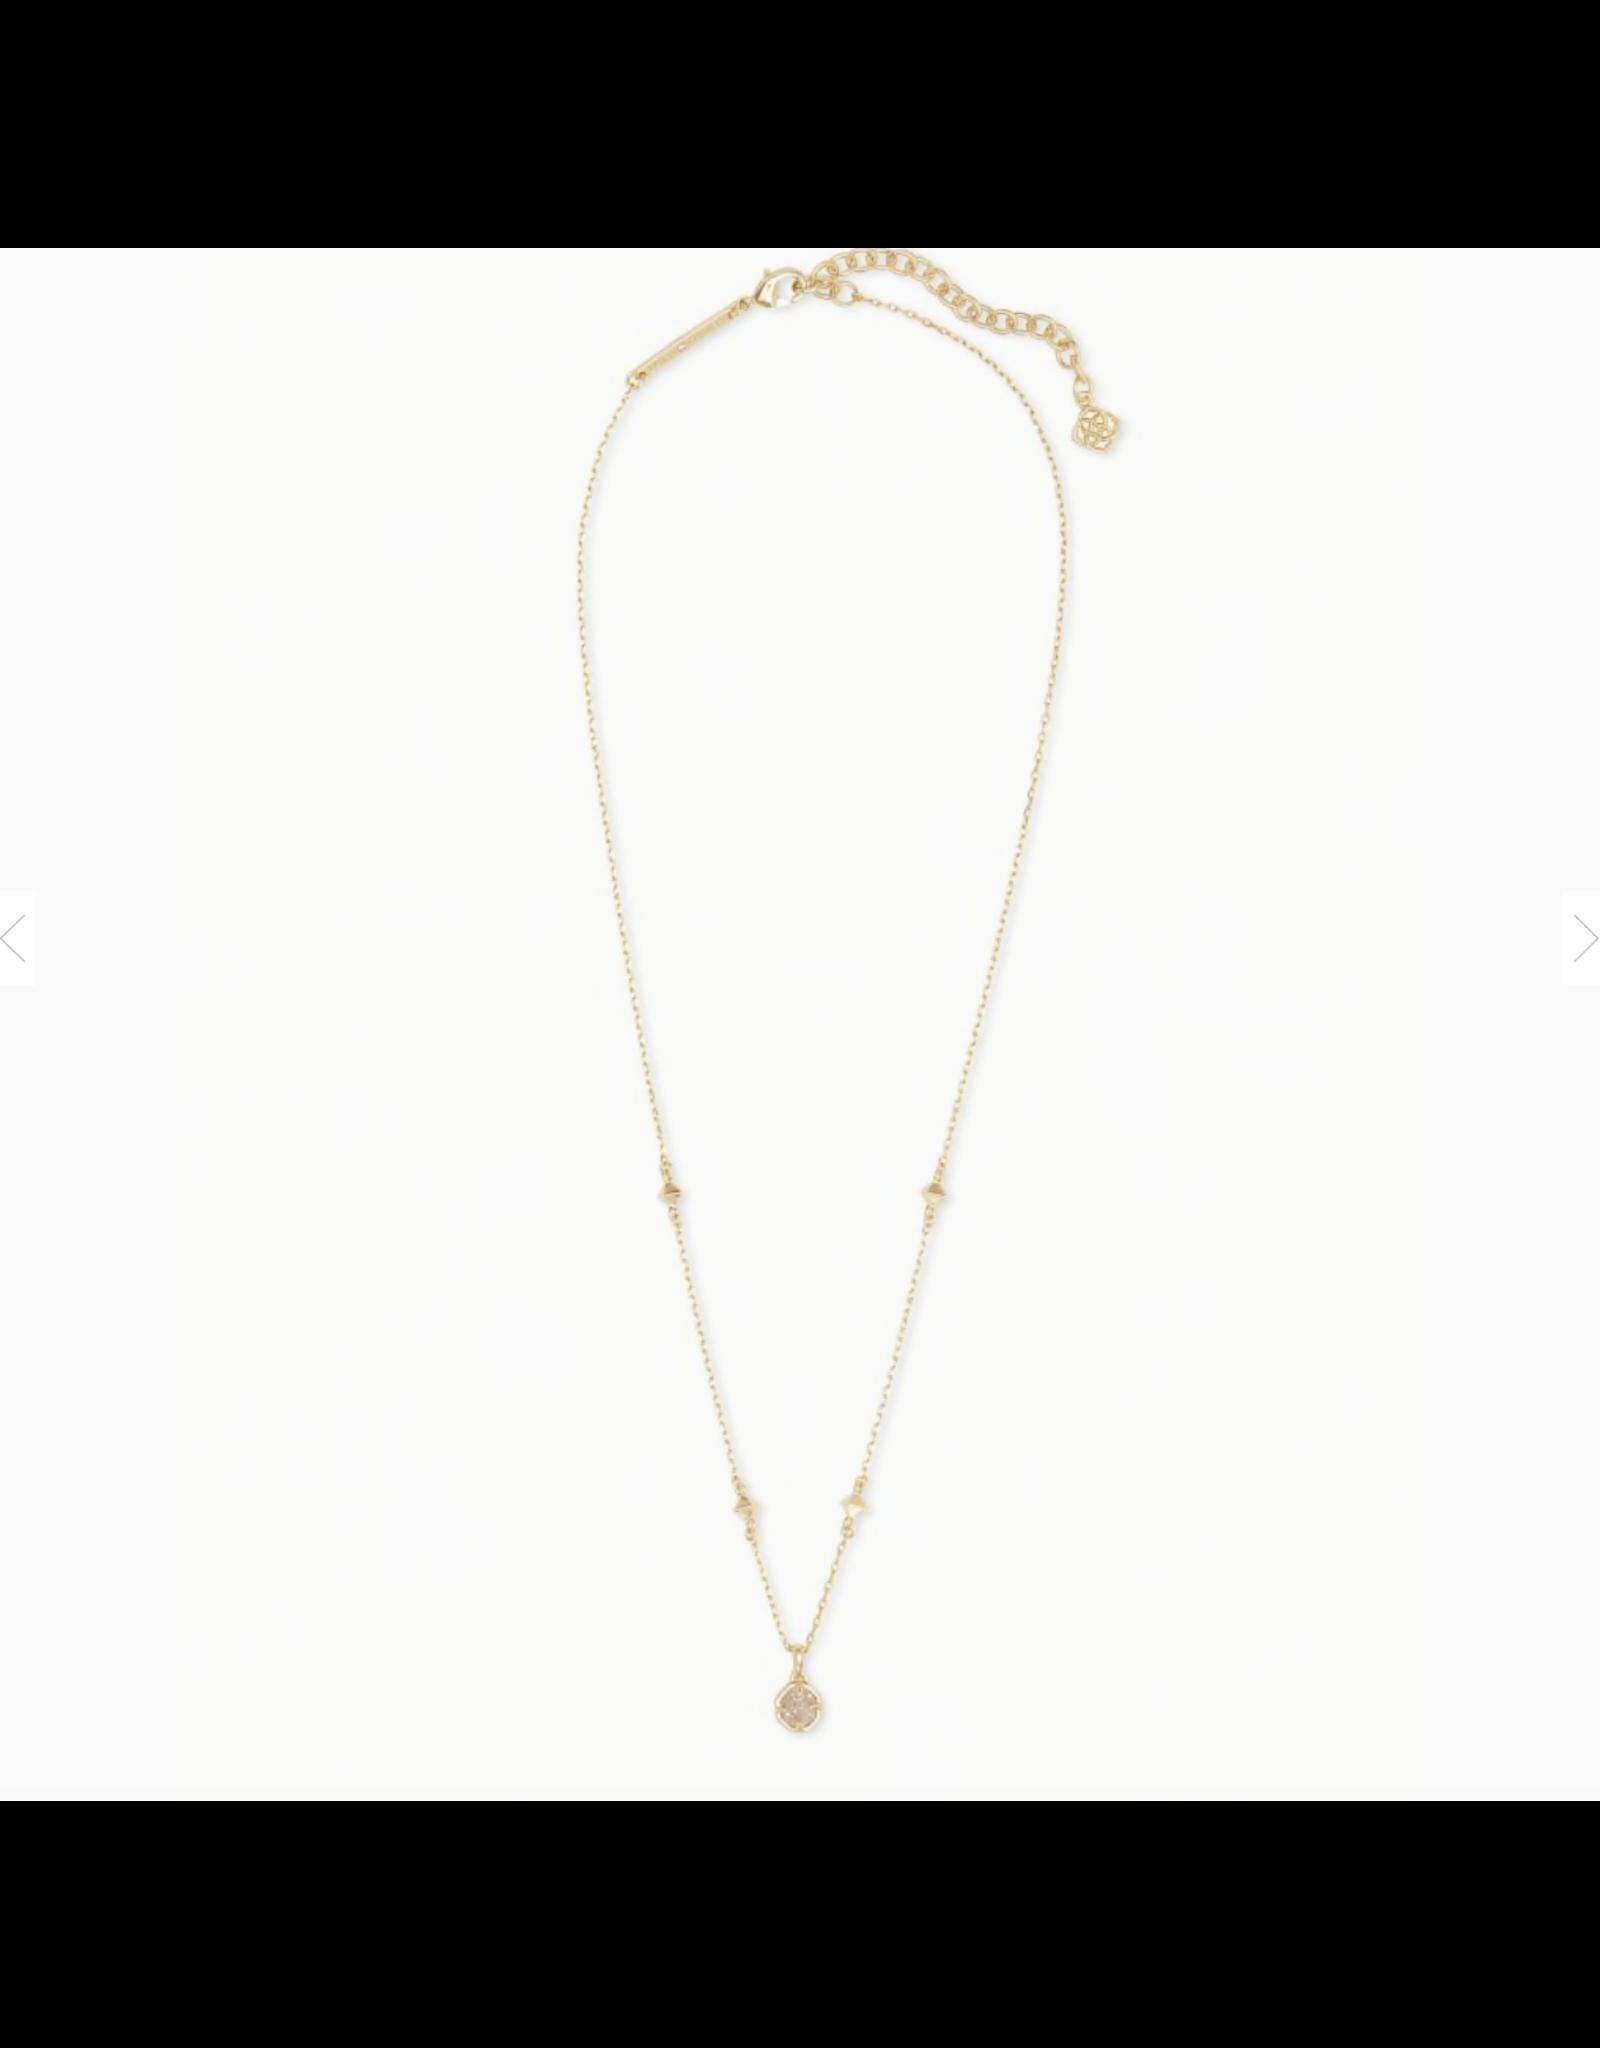 Kendra Scott Necklace Nola Short Pendant Gold Iridescent Drusy